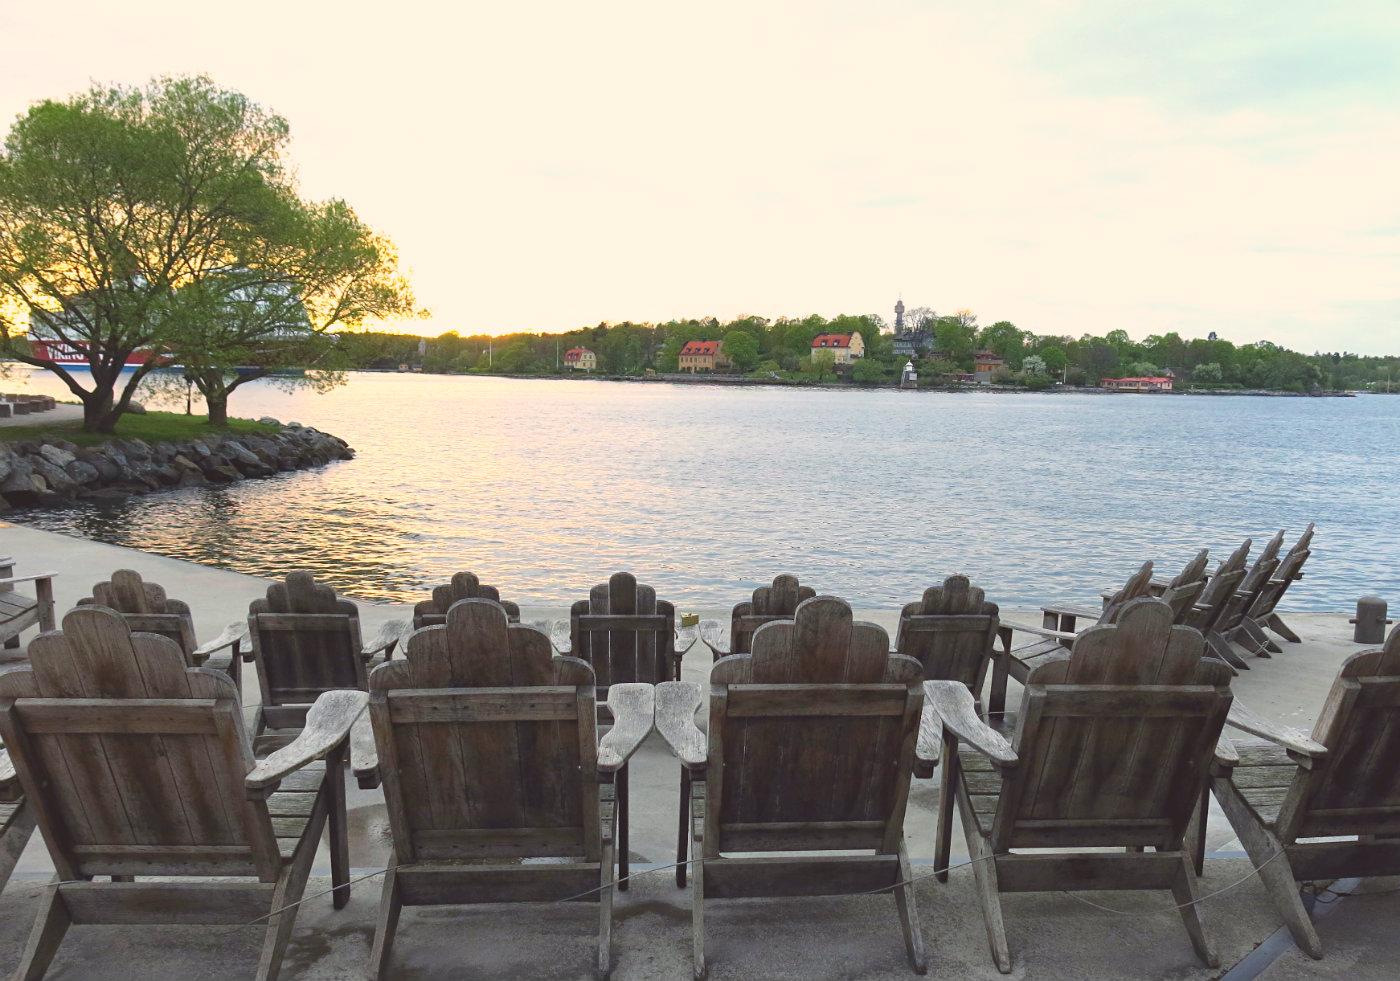 Stockholm-Schären-Nacka